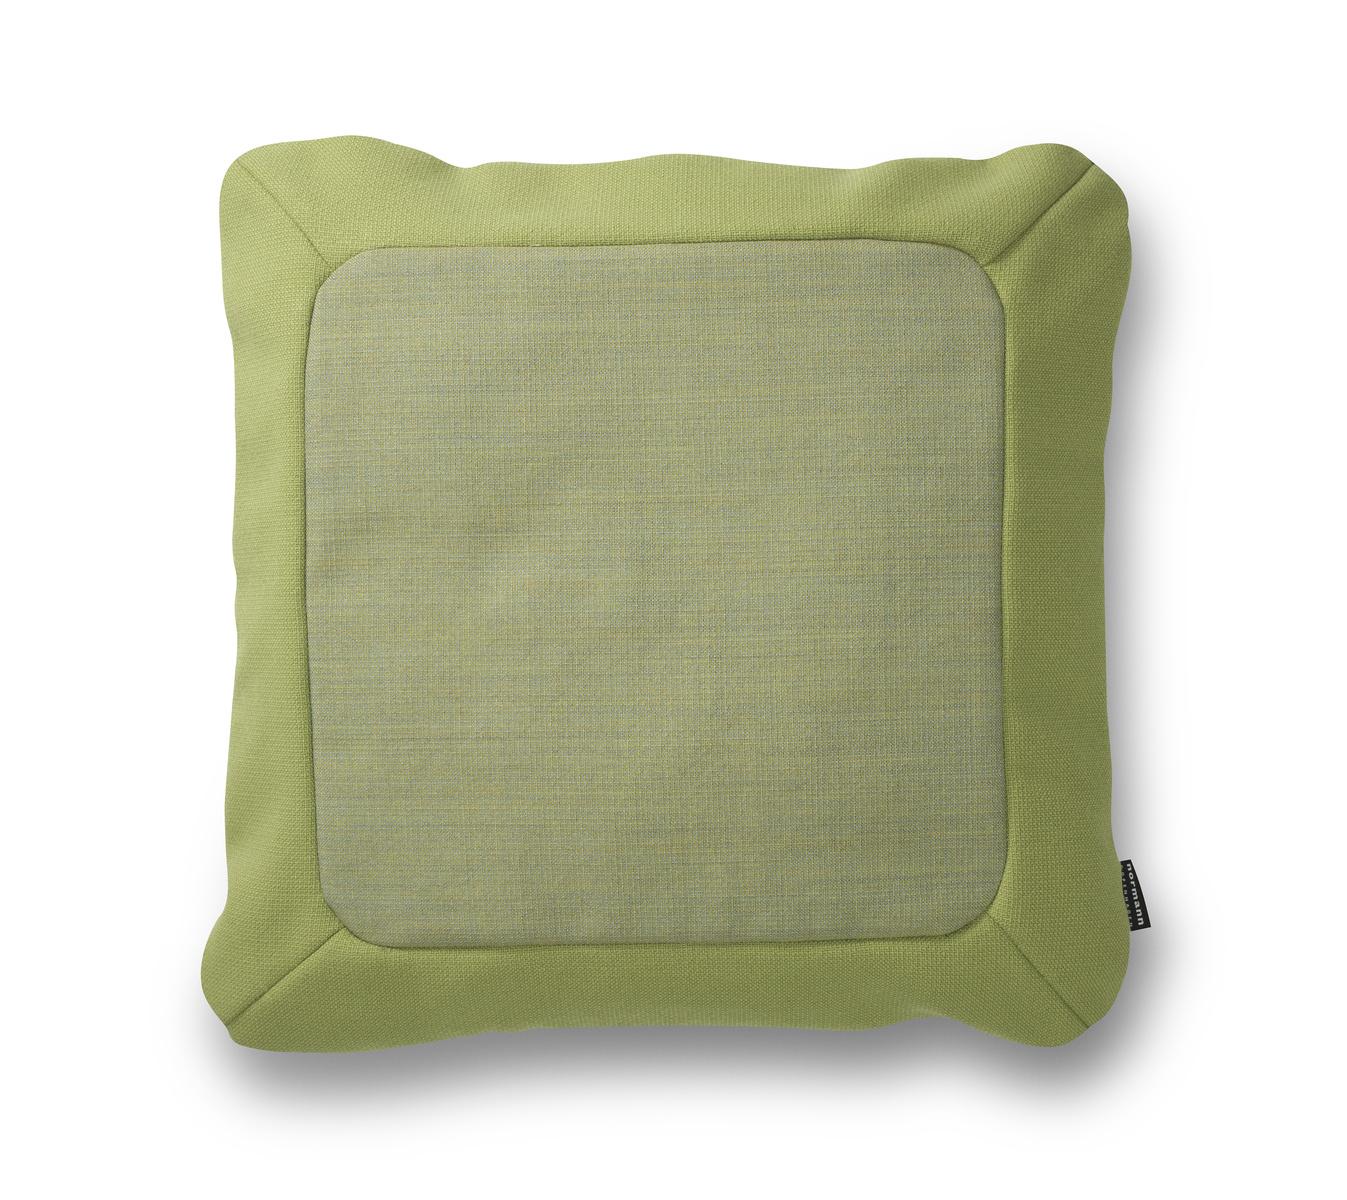 Normann Coppenhagen Vankúšik Frame 50 x 50 cm, zelený